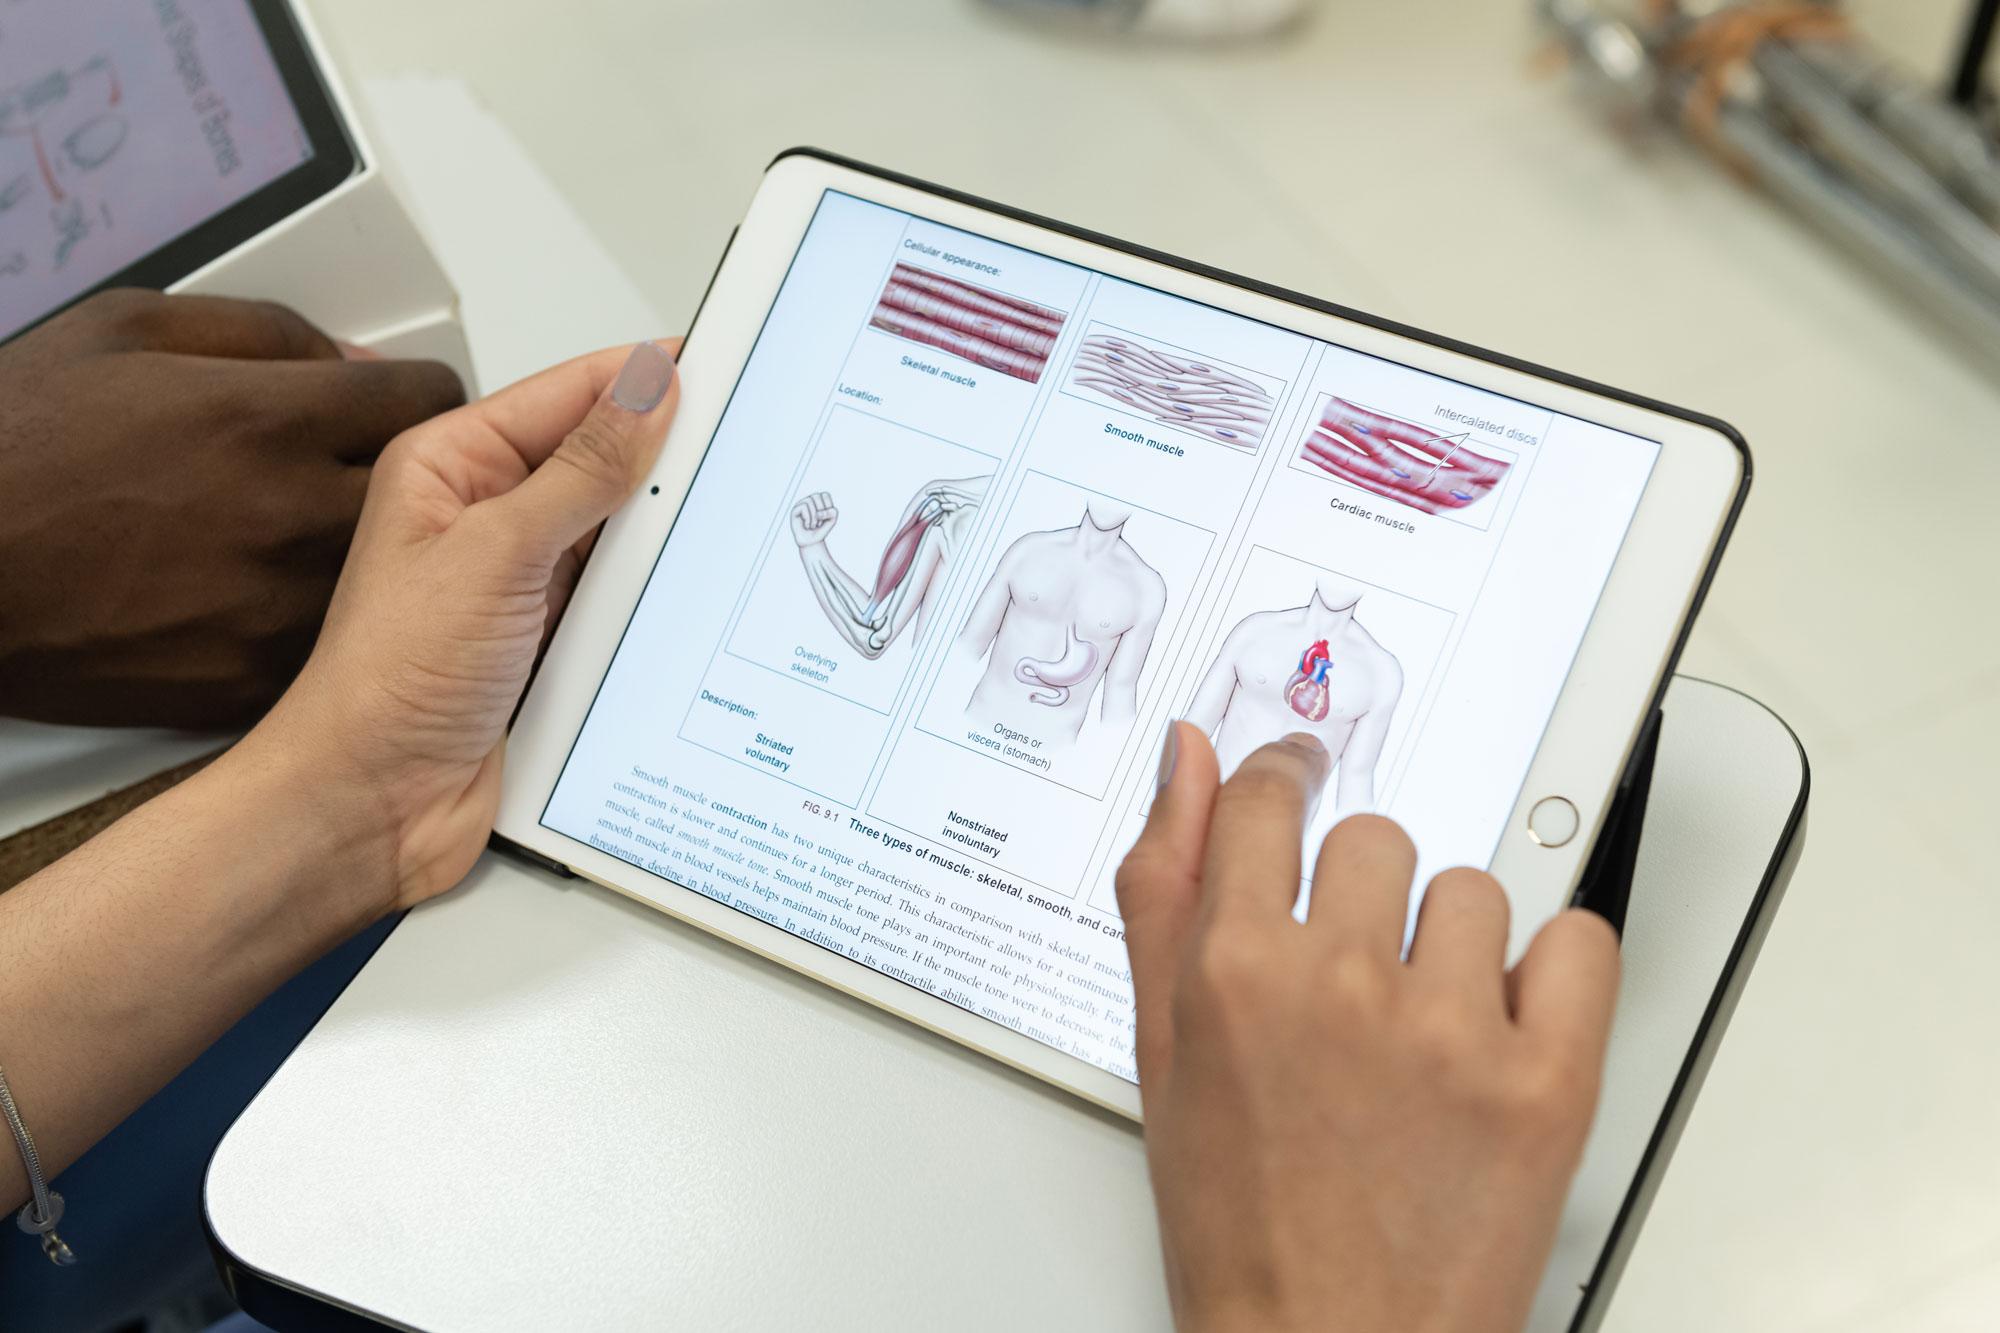 iPad Program Hero Image - Swedish Institute - New York, NY